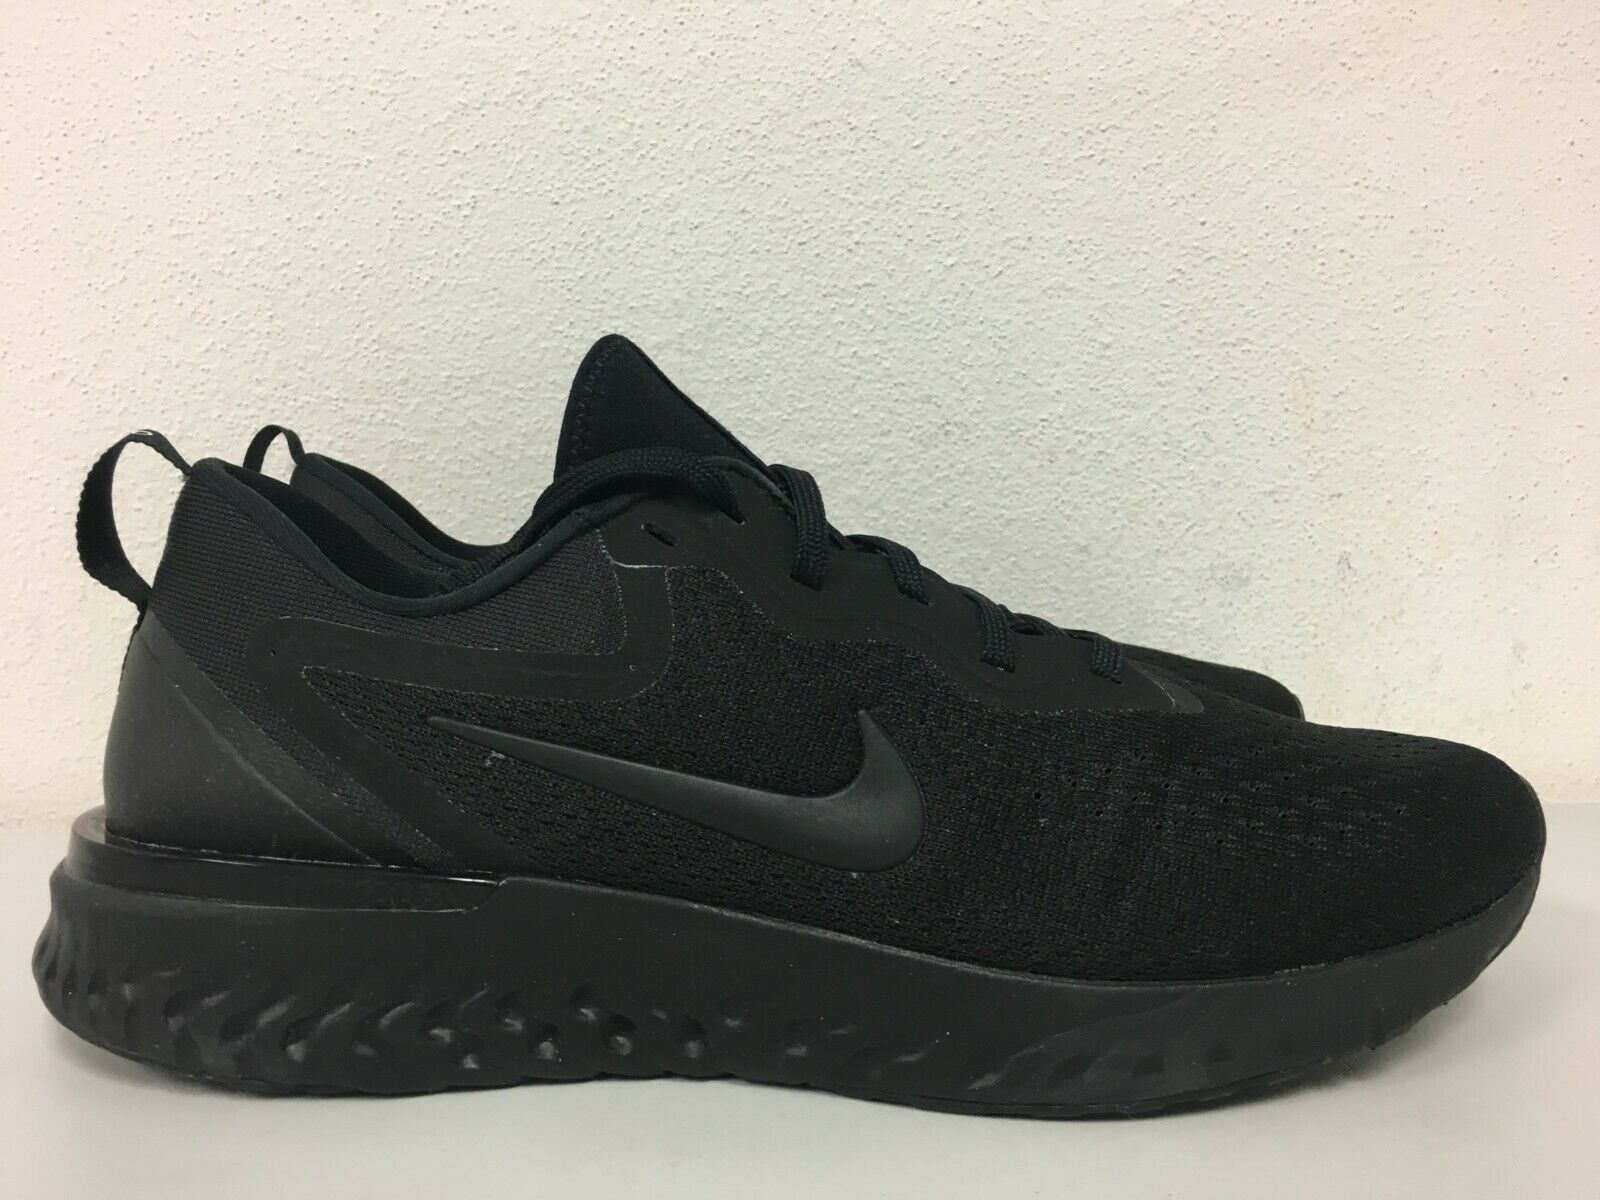 Nike Odyssey React Triple Black Blackout Epic Black OG AO9819-010 Size 10